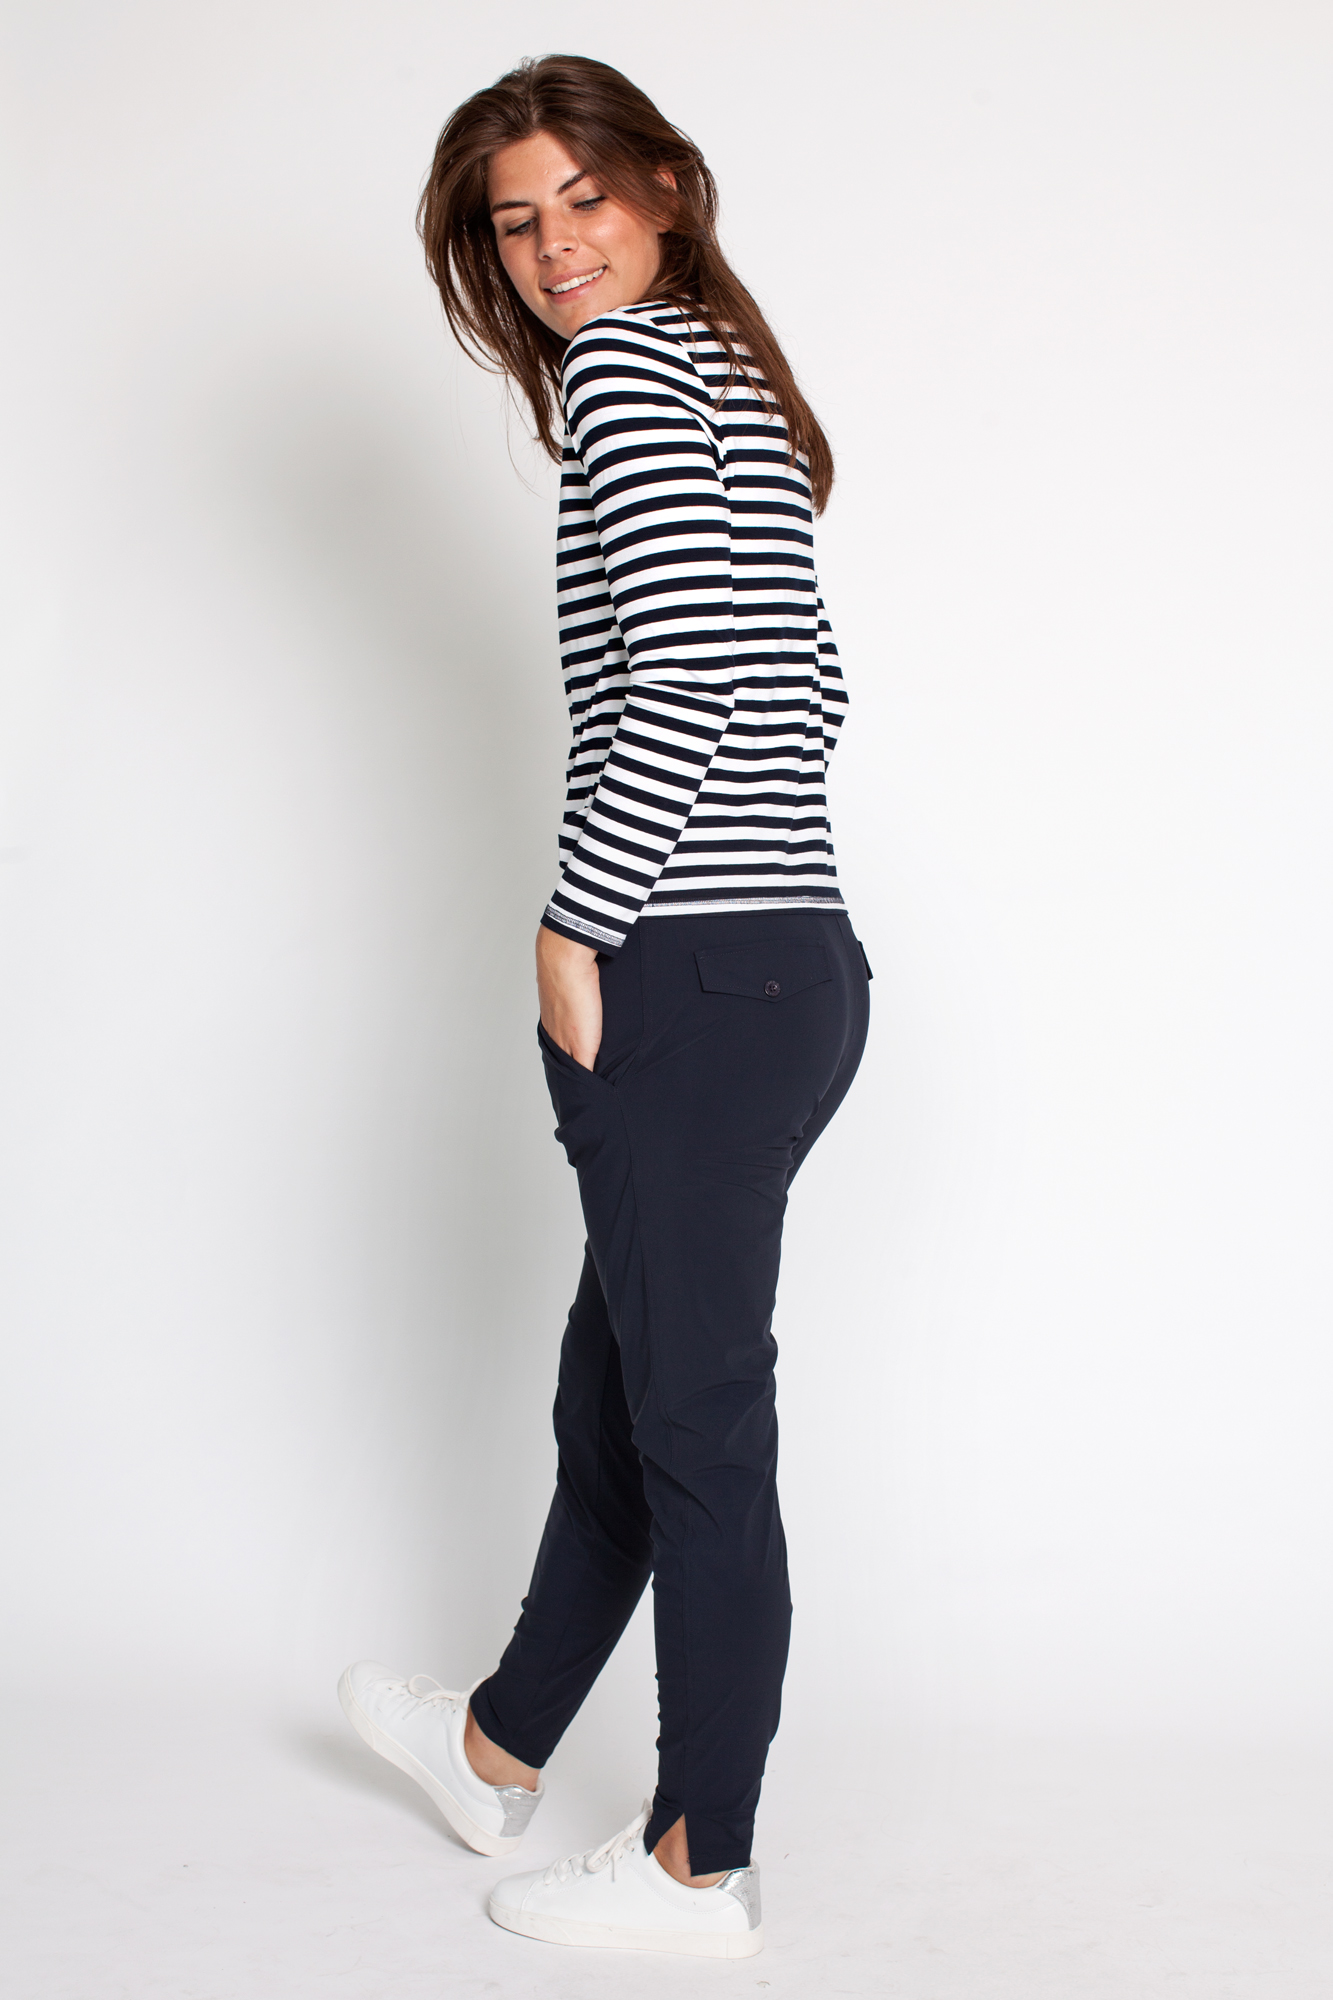 studio anneloes pantalon upstairs 1500x1500 17172 - Studio Anneloes Broek Zwart Sale